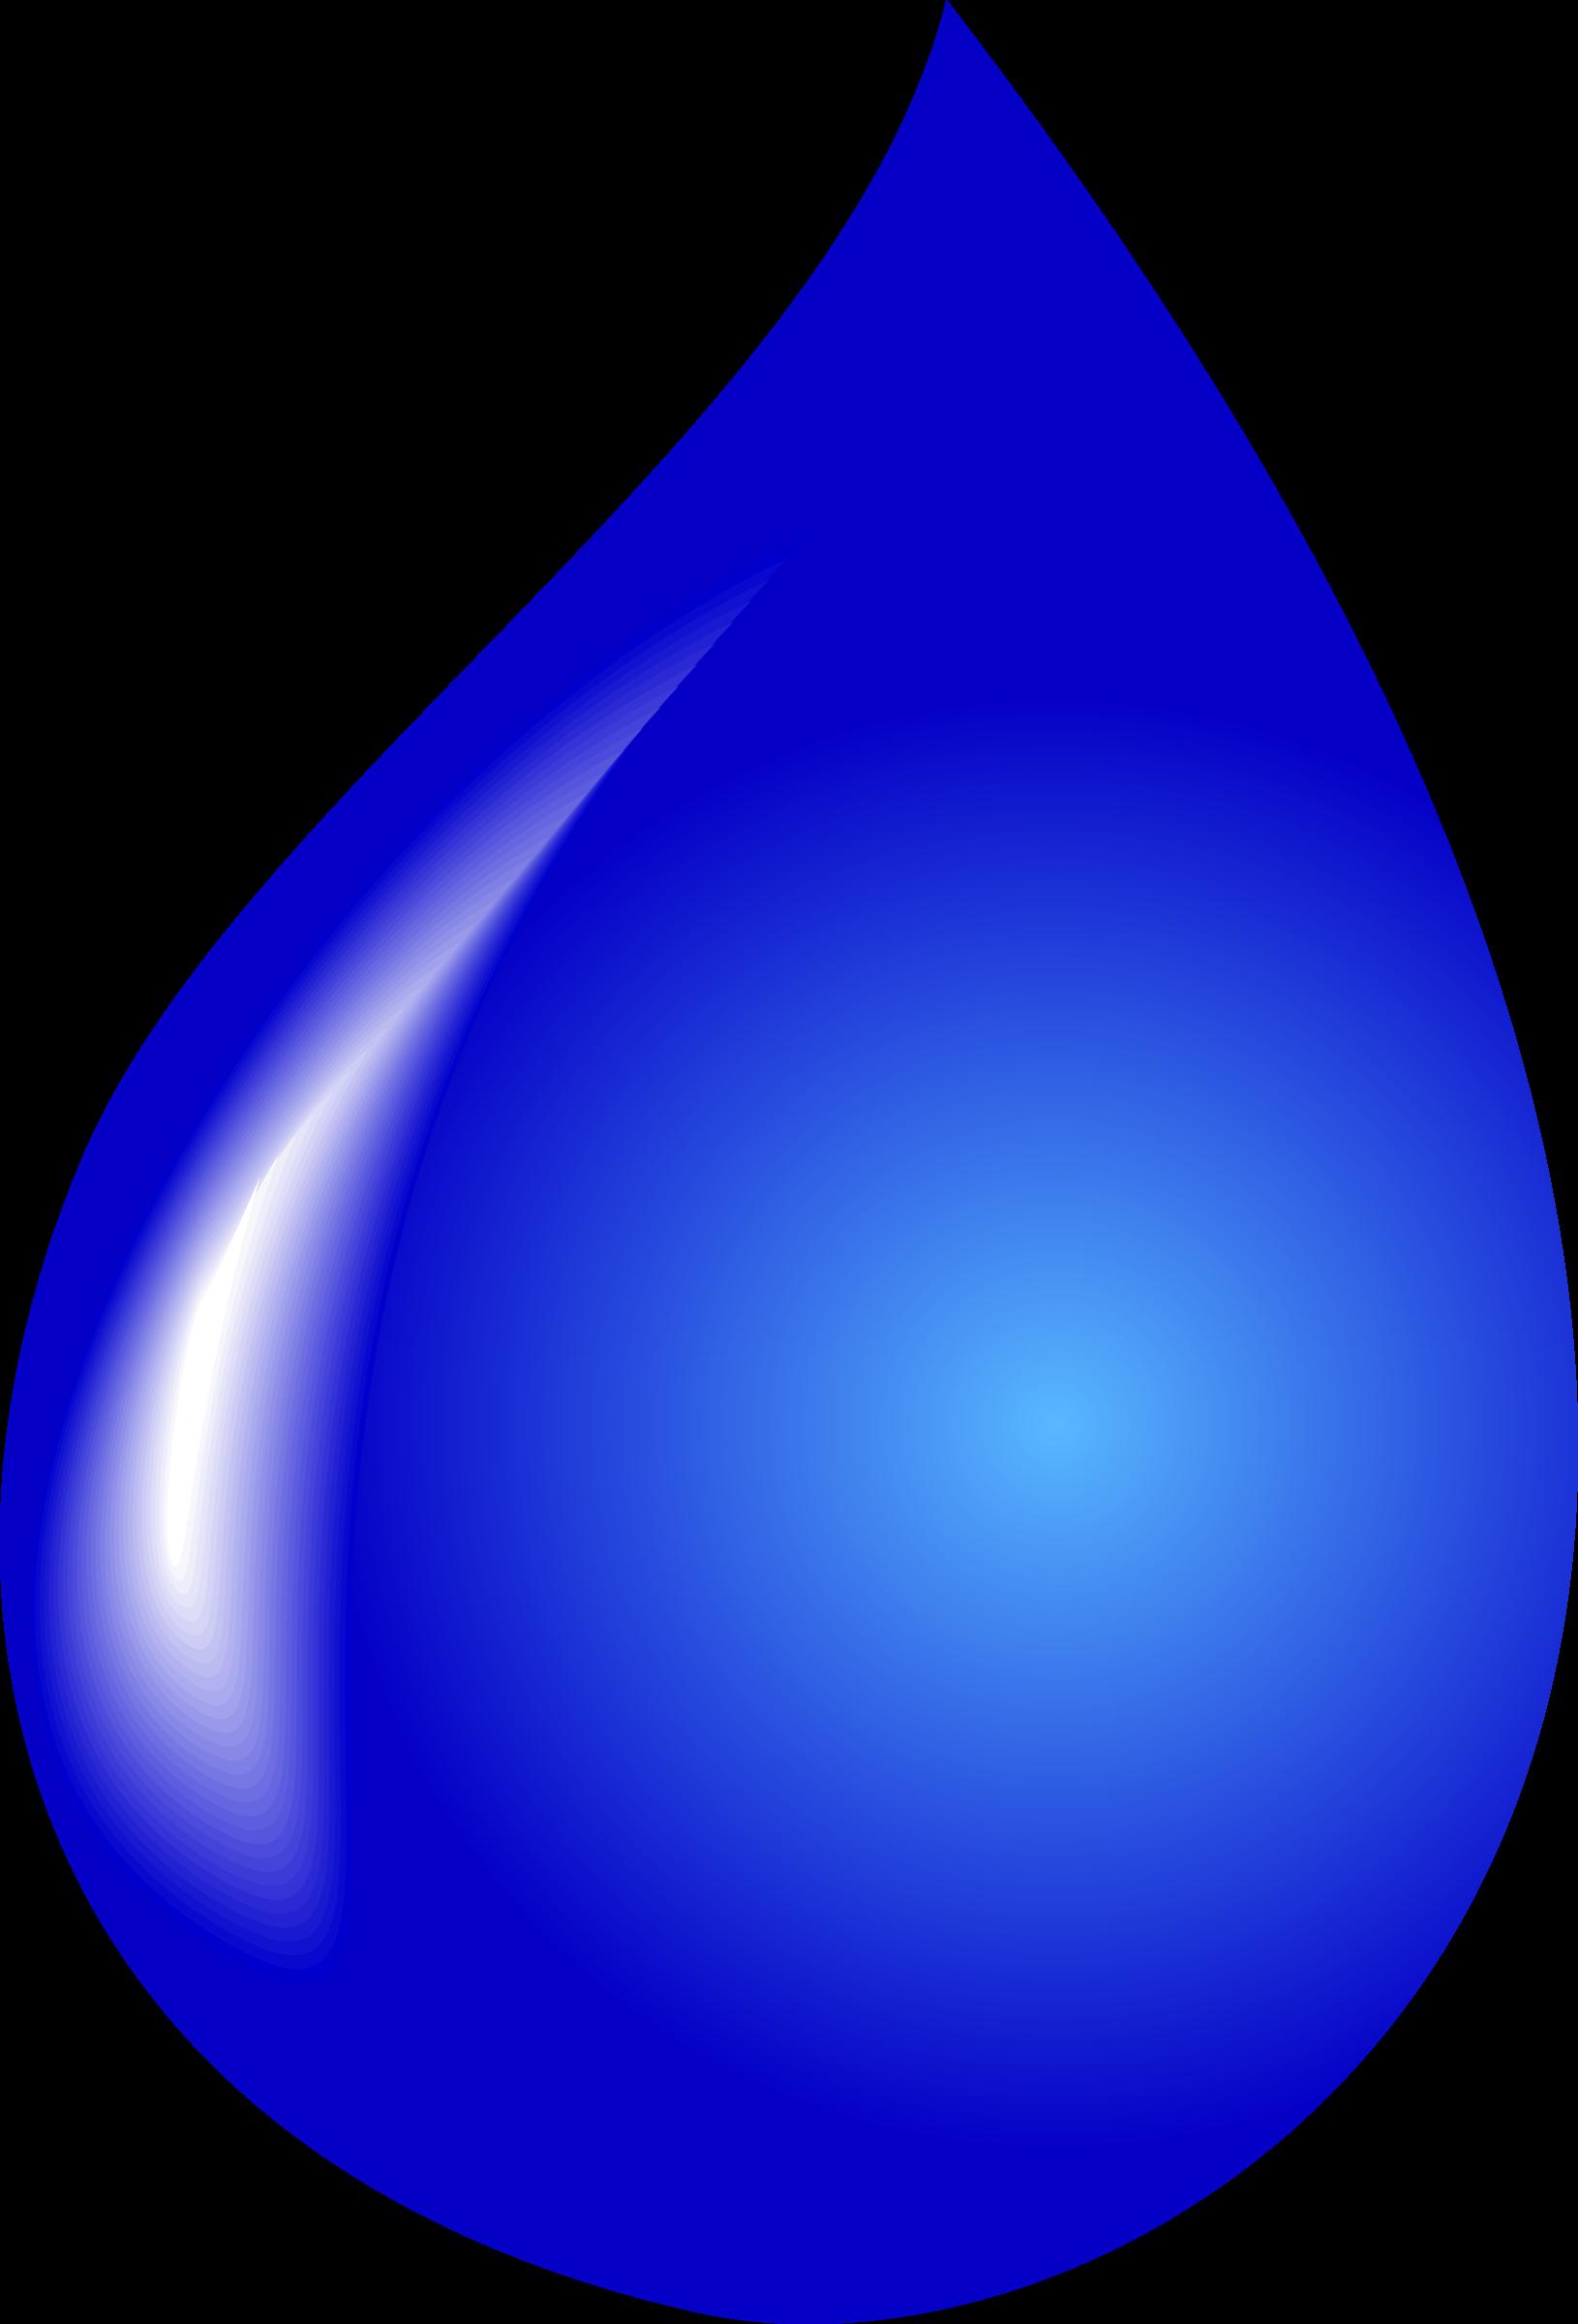 CARTOONwater Droplet - ClipArt Best